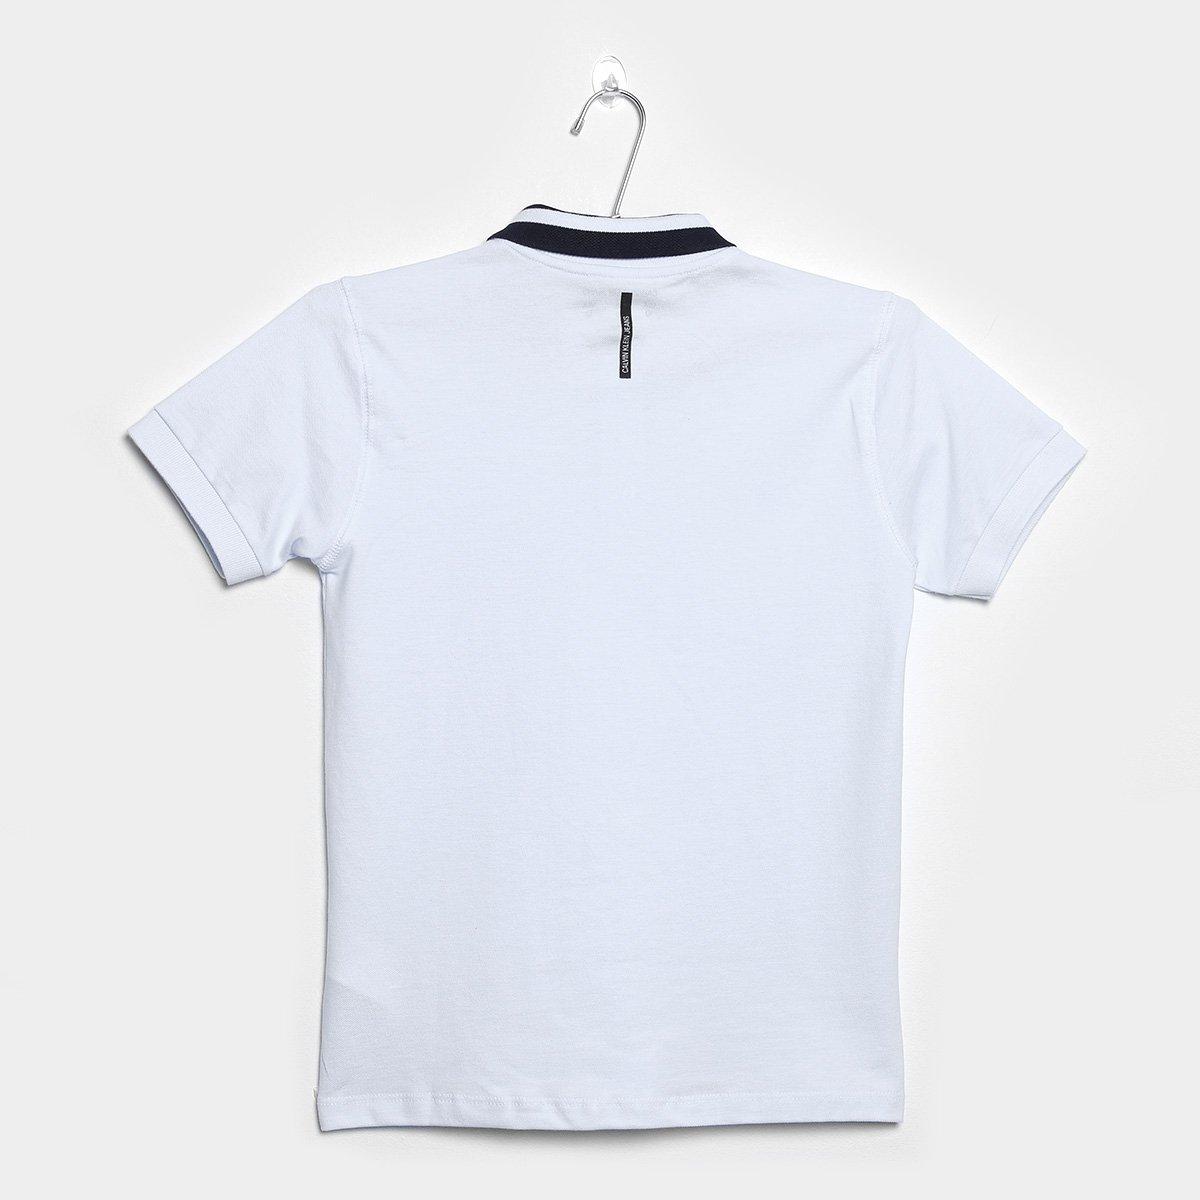 df8c7c54eb Camisa Polo Infantil Calvin Klein Gola CK Jeans Masculina - Branco ...